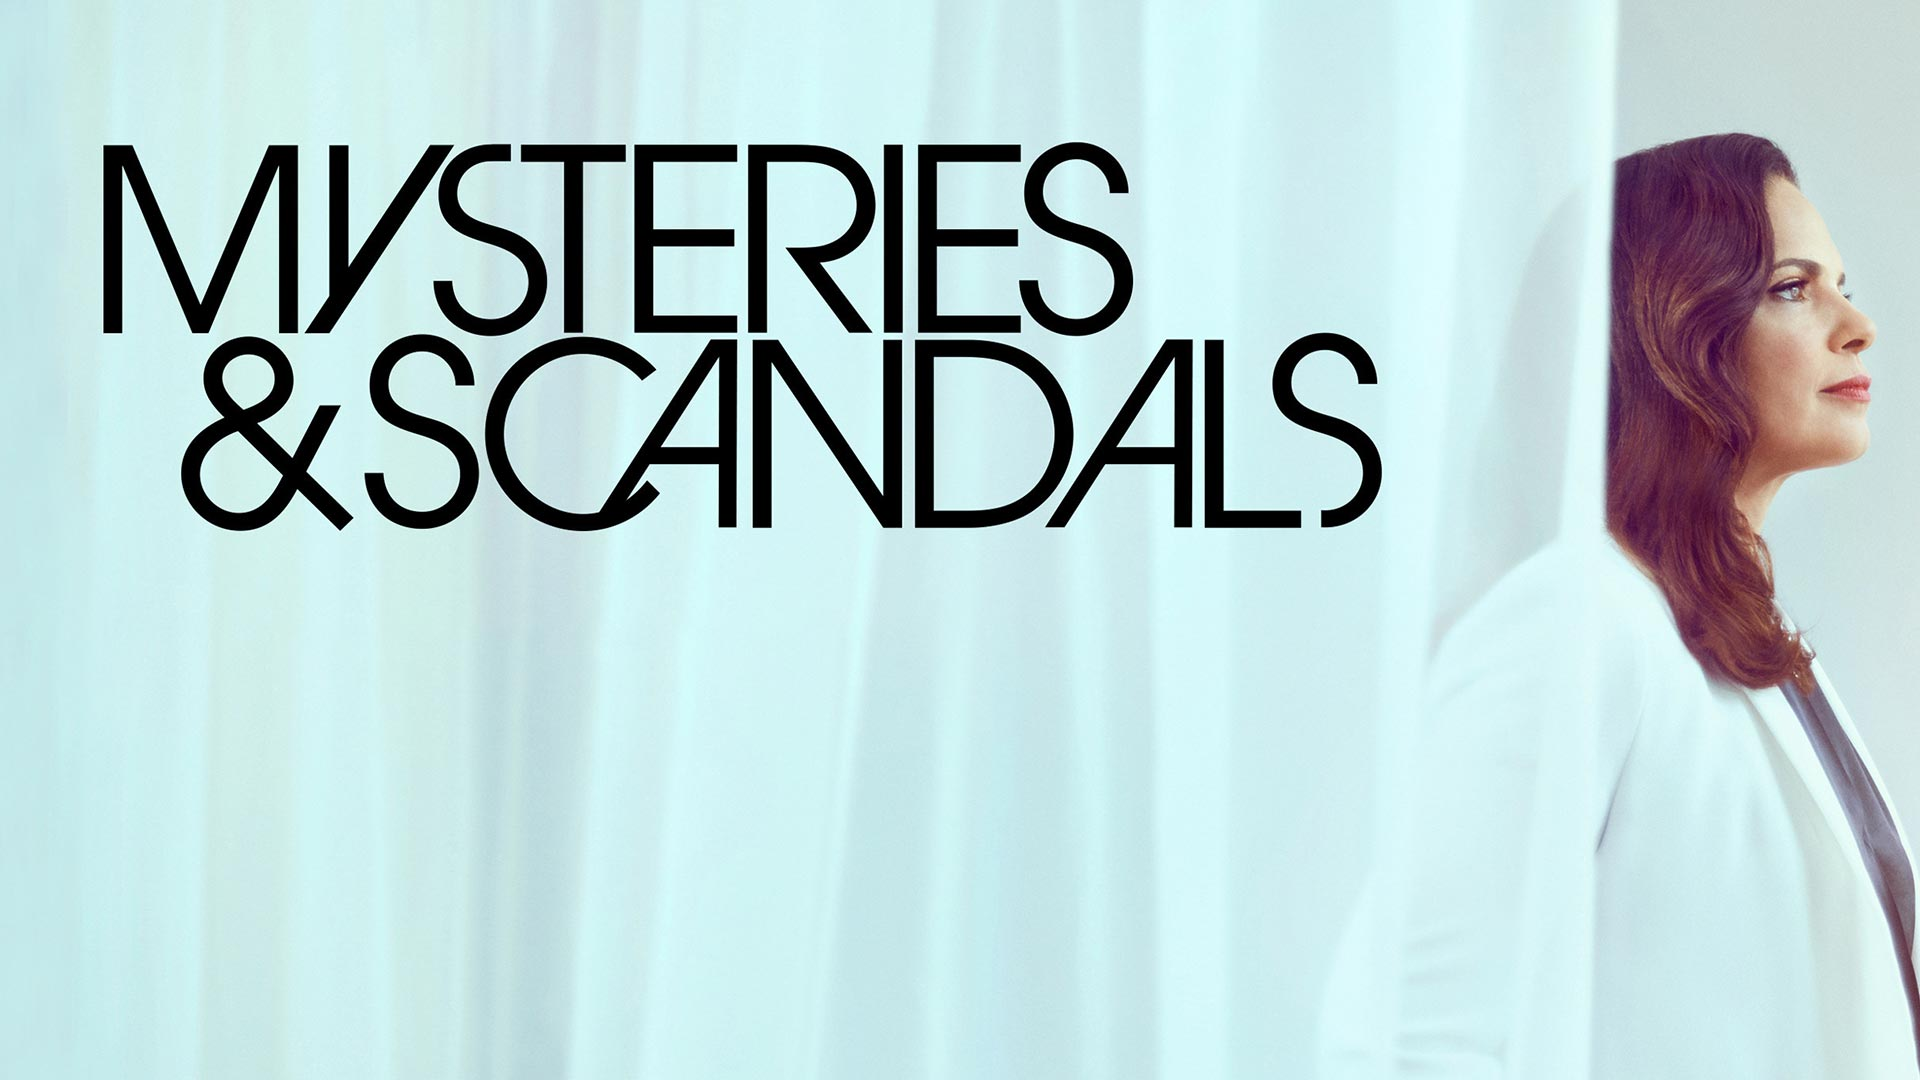 Mysteries & Scandals Season 1